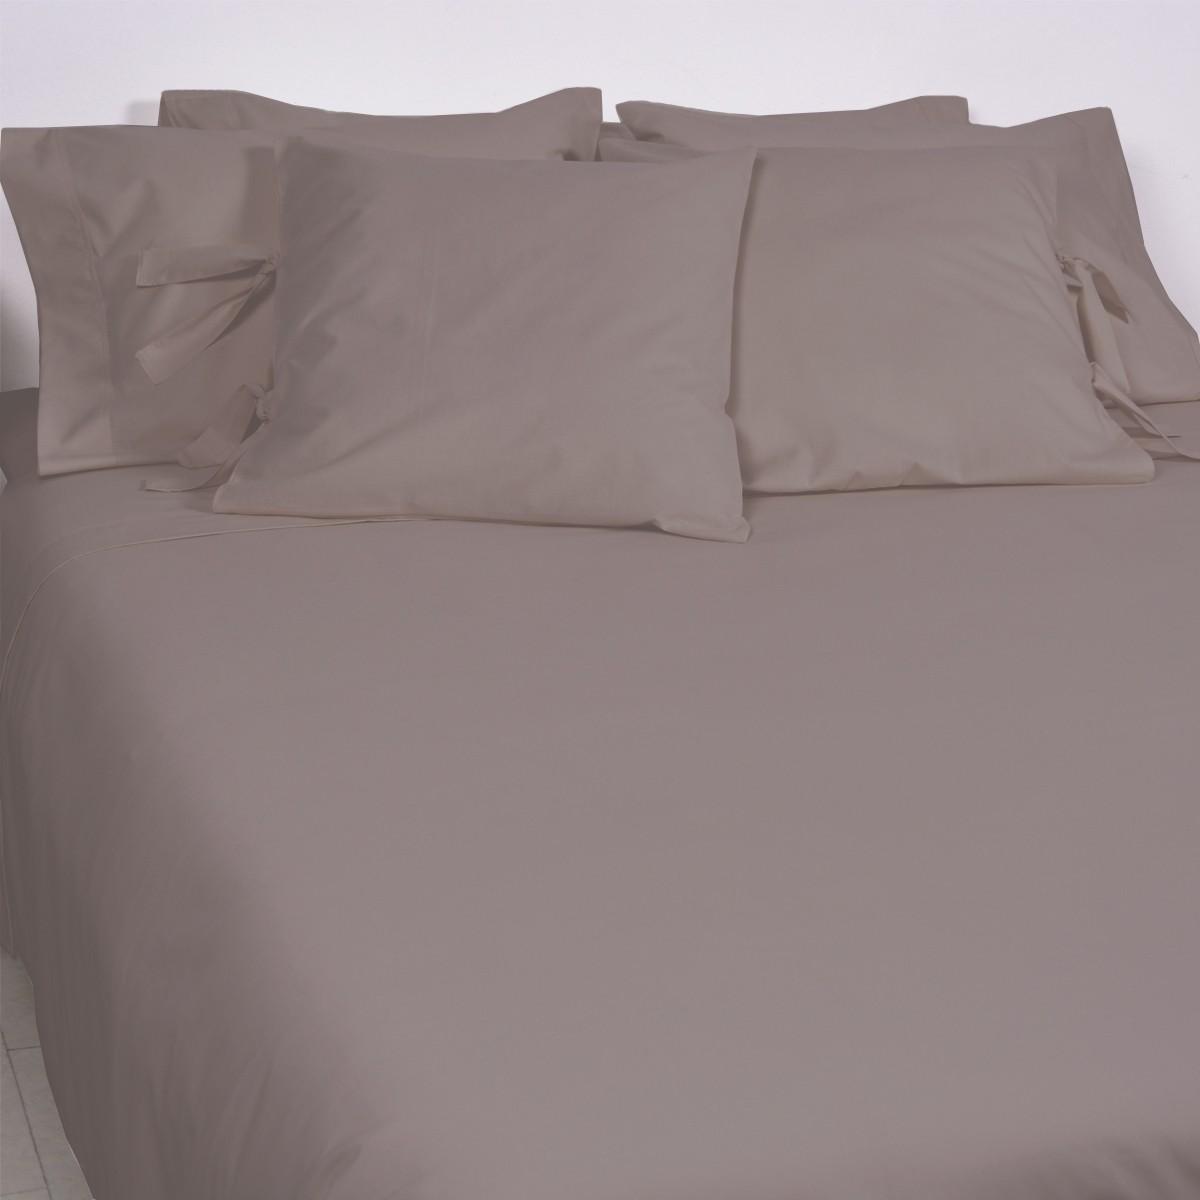 Duvet Cover, Nude